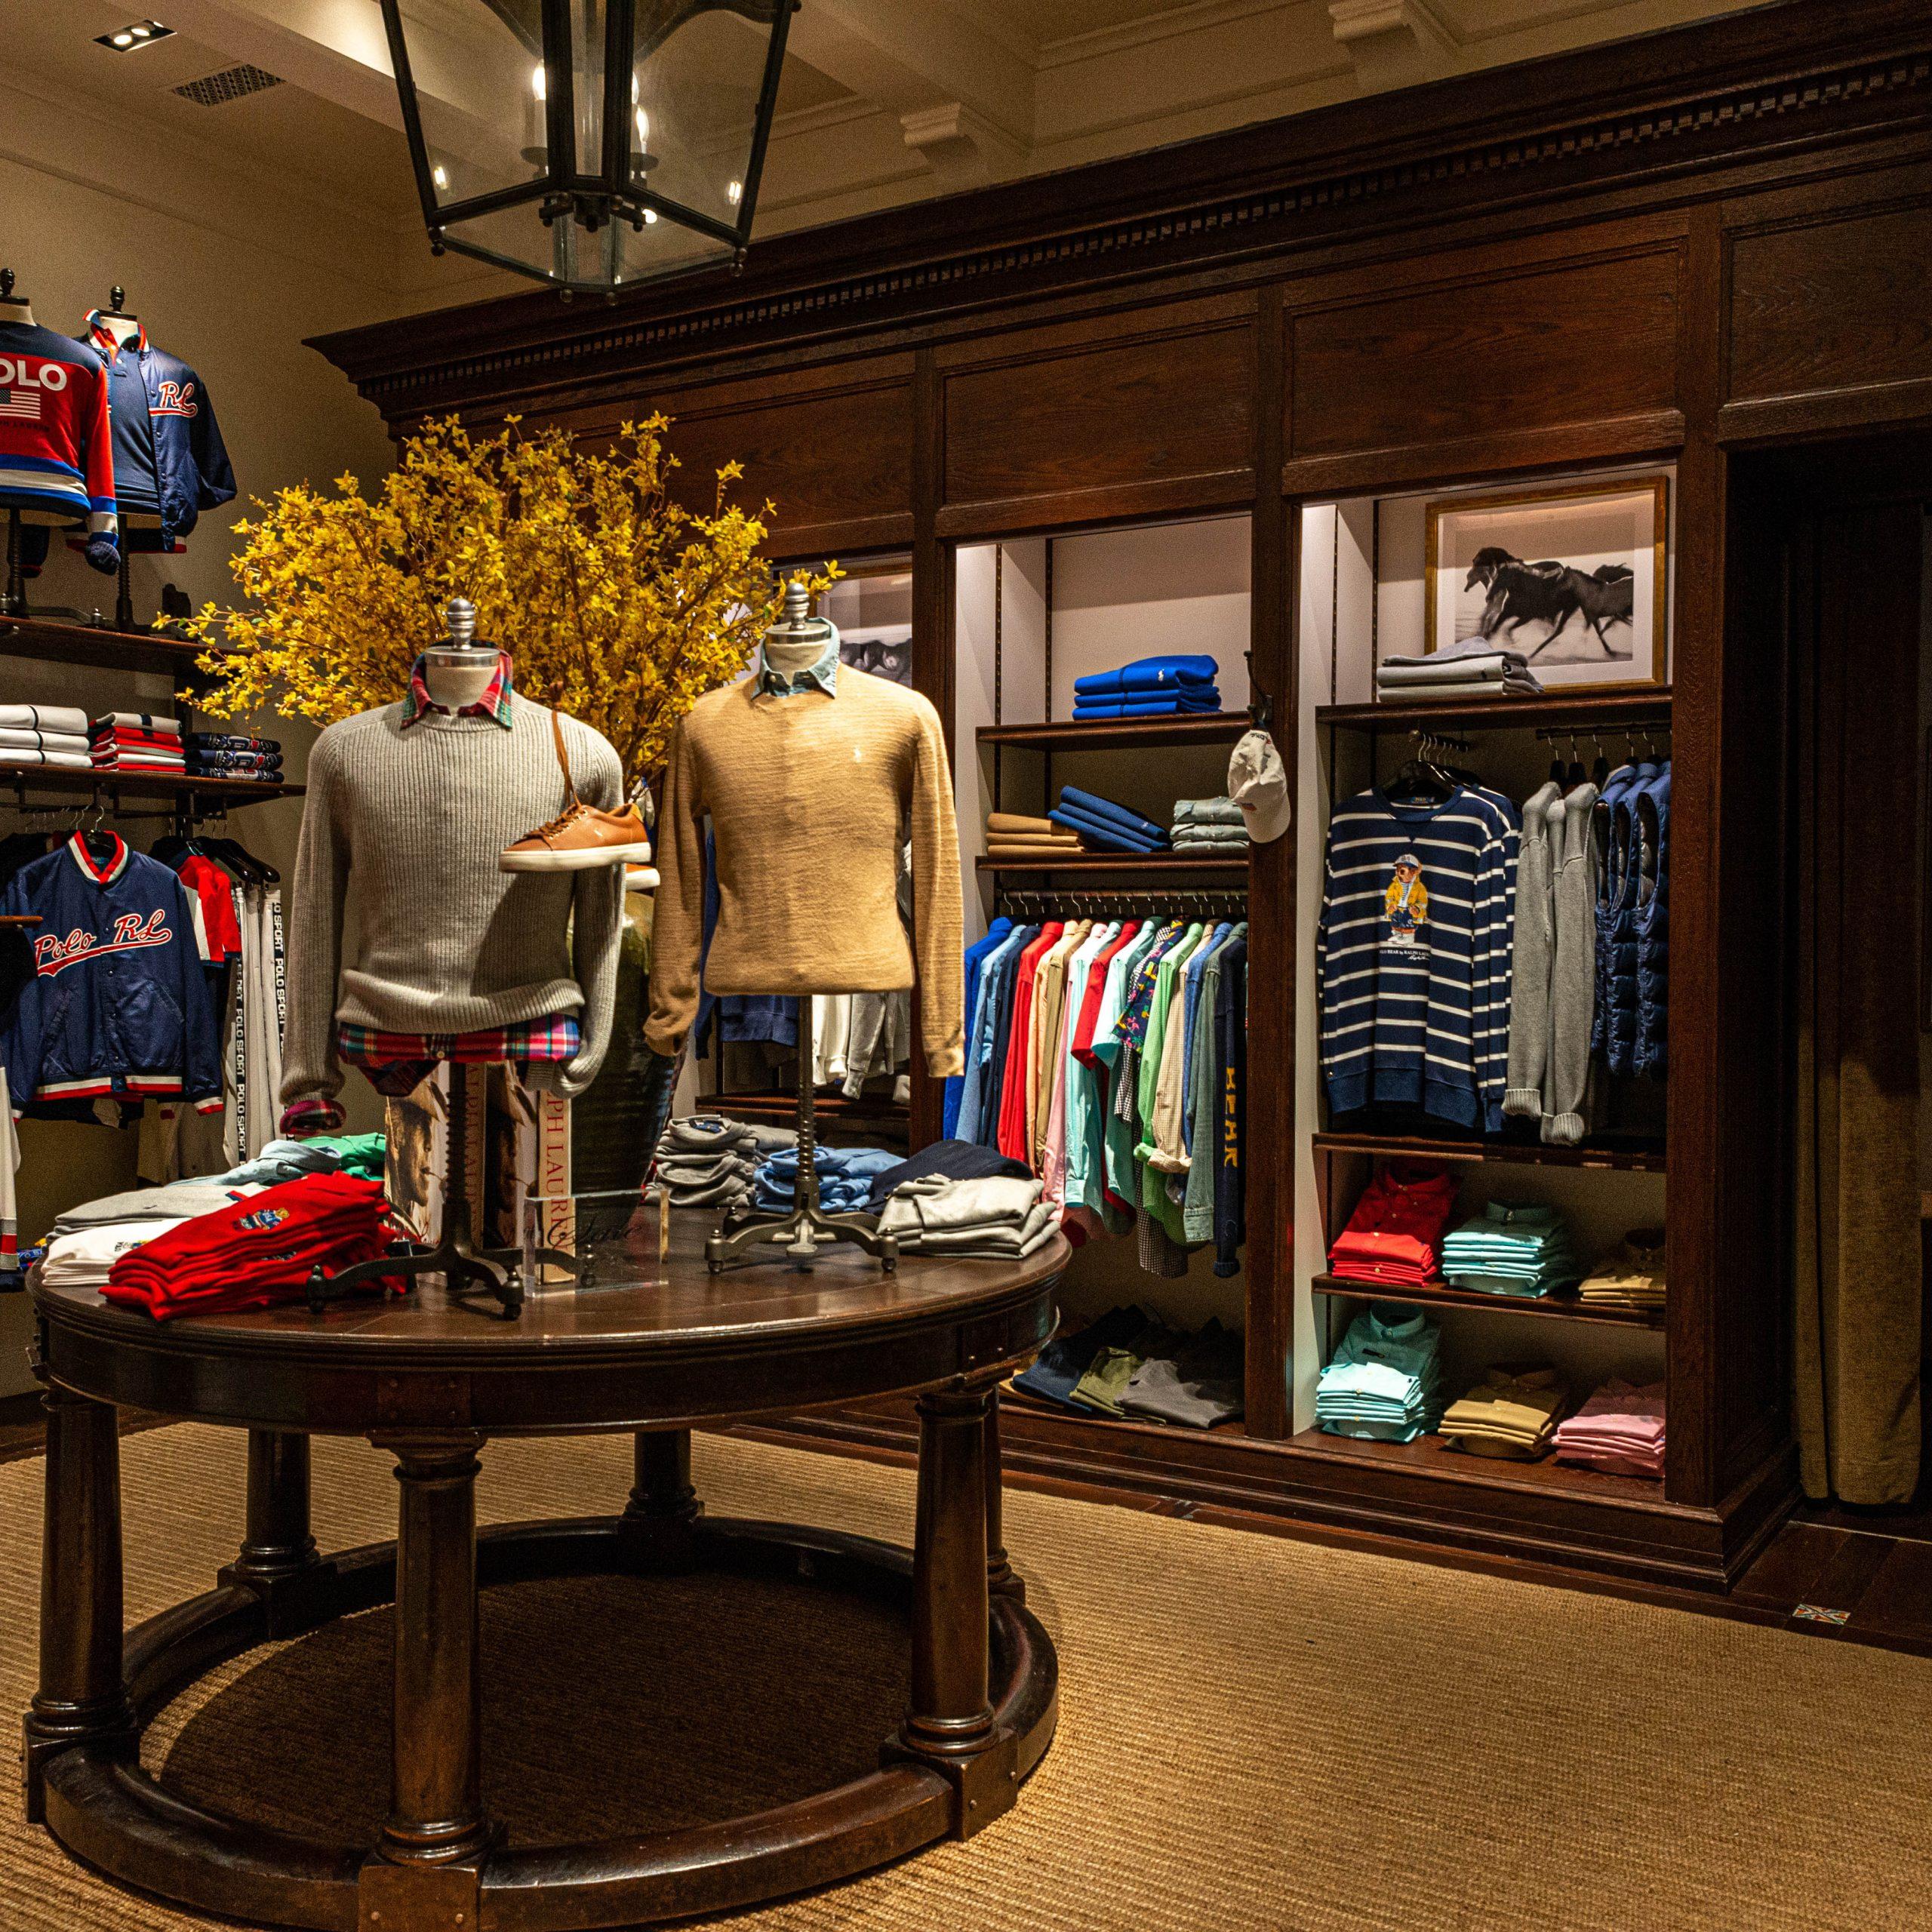 Polo Ralph Lauren at The Mall of the Emirates – Dubai, UAE